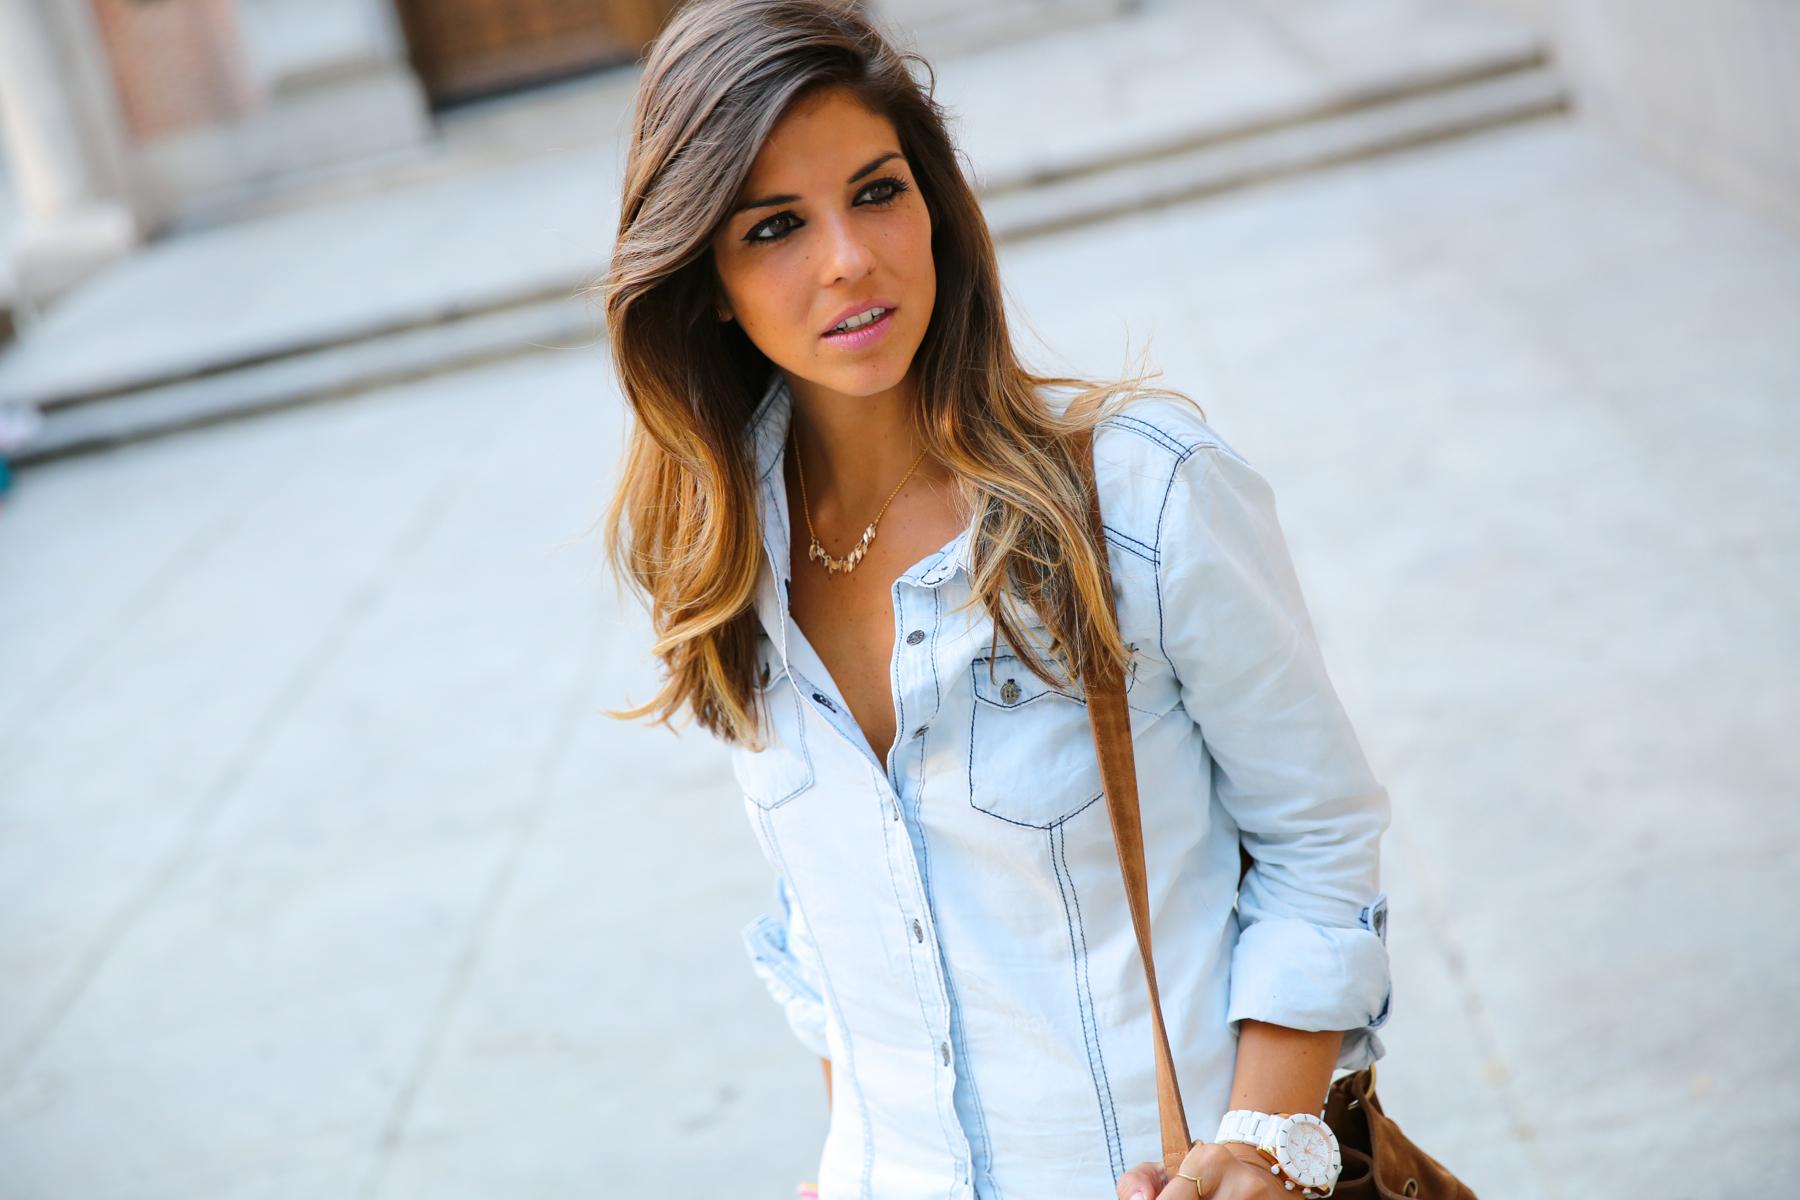 trendy_taste-look-outfit-street_style-denim-blog-blogger-fashion_spain-moda_españa-botines_camperos-it_shoes-cowboy_booties-skirt-falda-bolso_flecos-fringes_bag-camisa_vaquera-denim_shirt-5